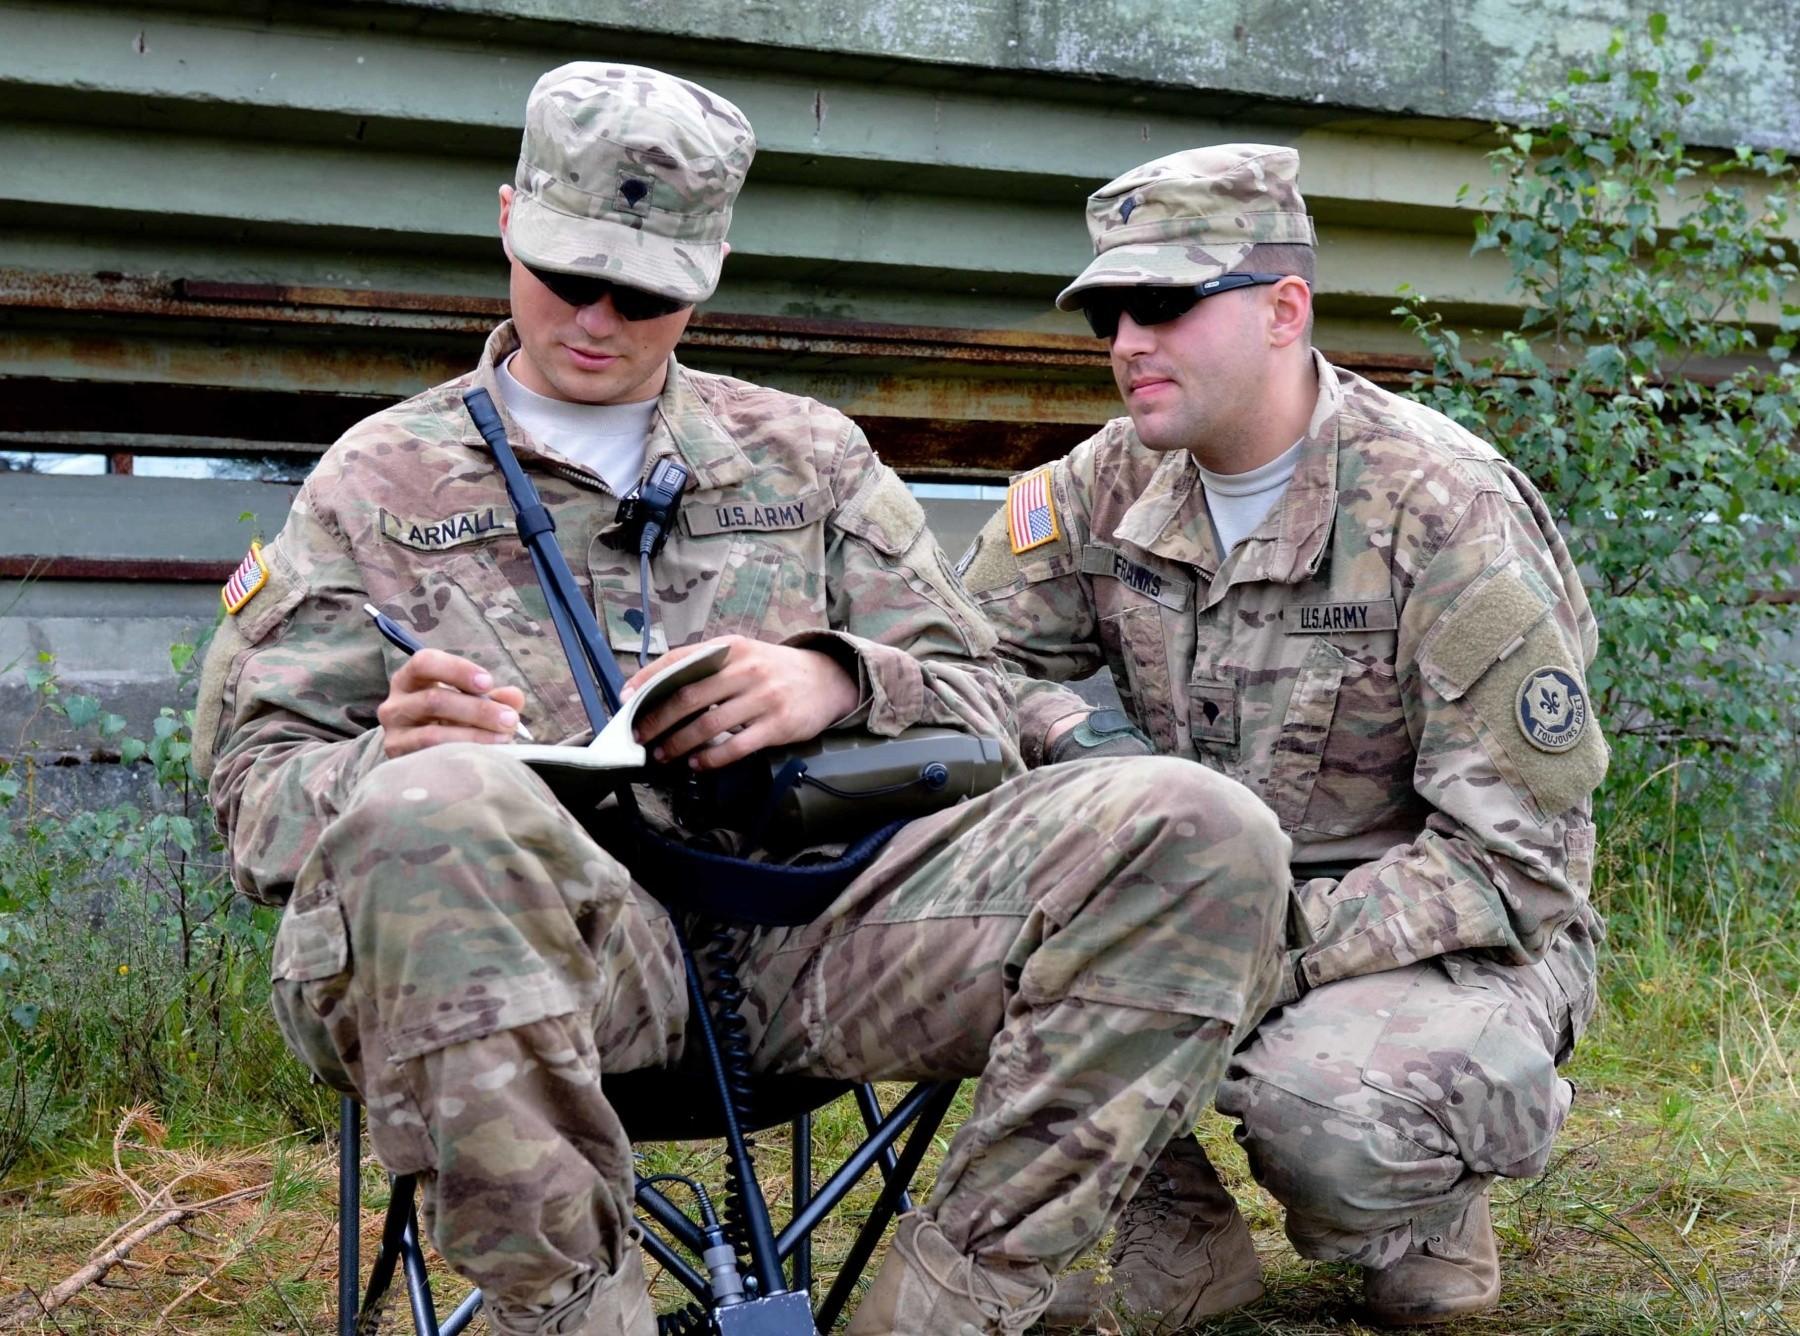 U S Army Heavy Mortar Platoon : Platoons use skills at mortar range in poland article